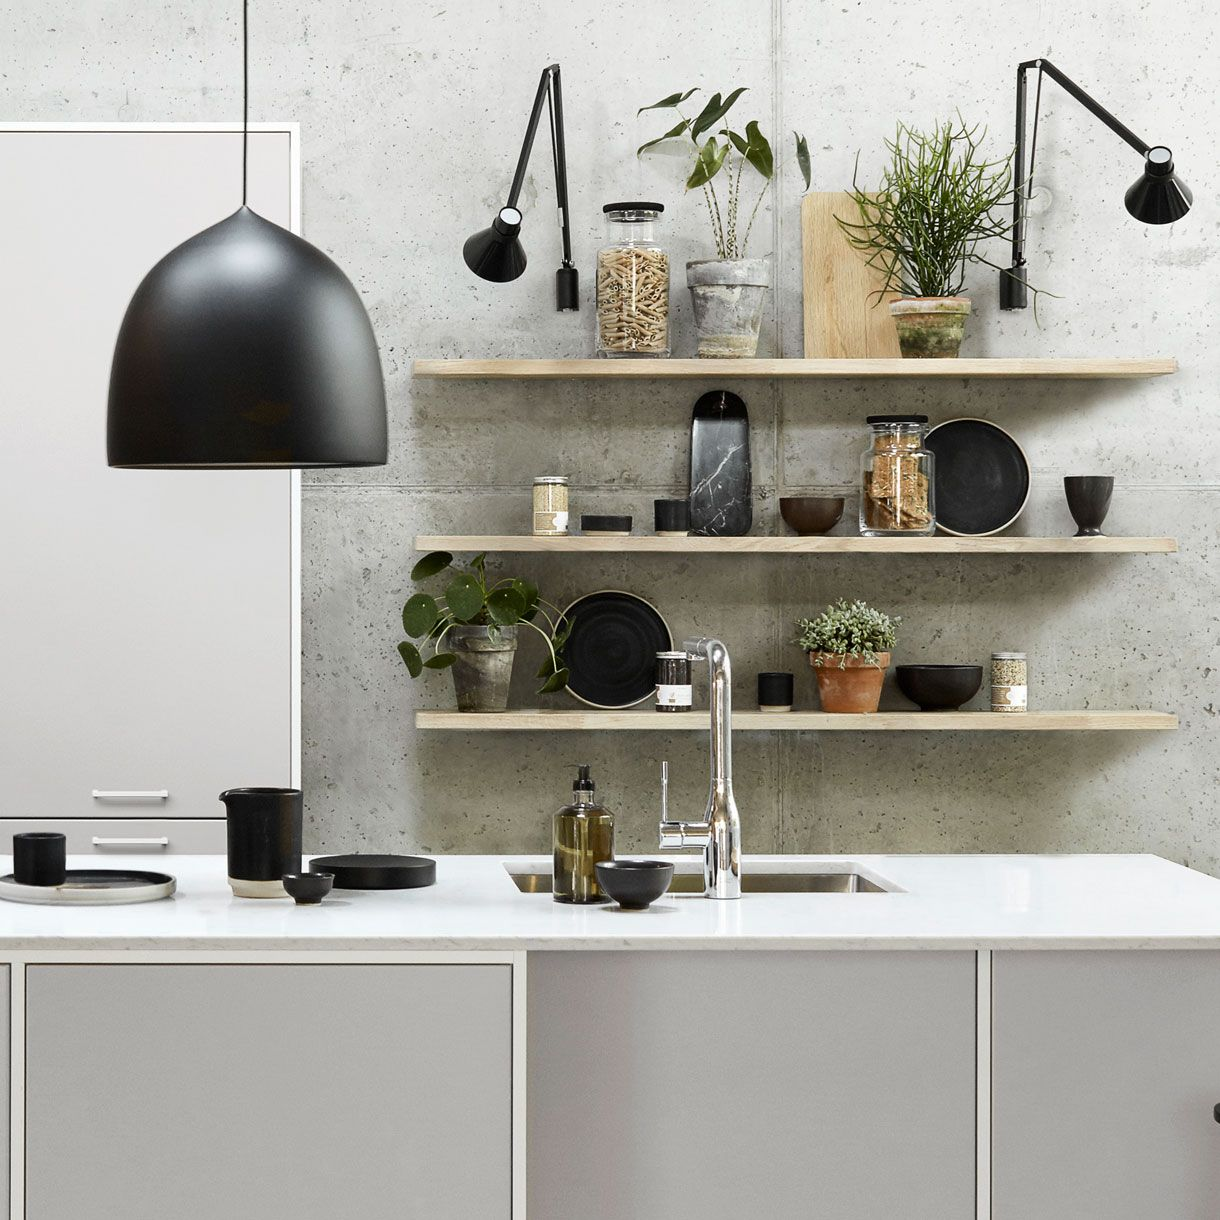 www.kvik.fi ~ media images kitchen hero-kitchens modu-light-grey details modu-light-grey-zoom-reol-1220x1220px.jpg;